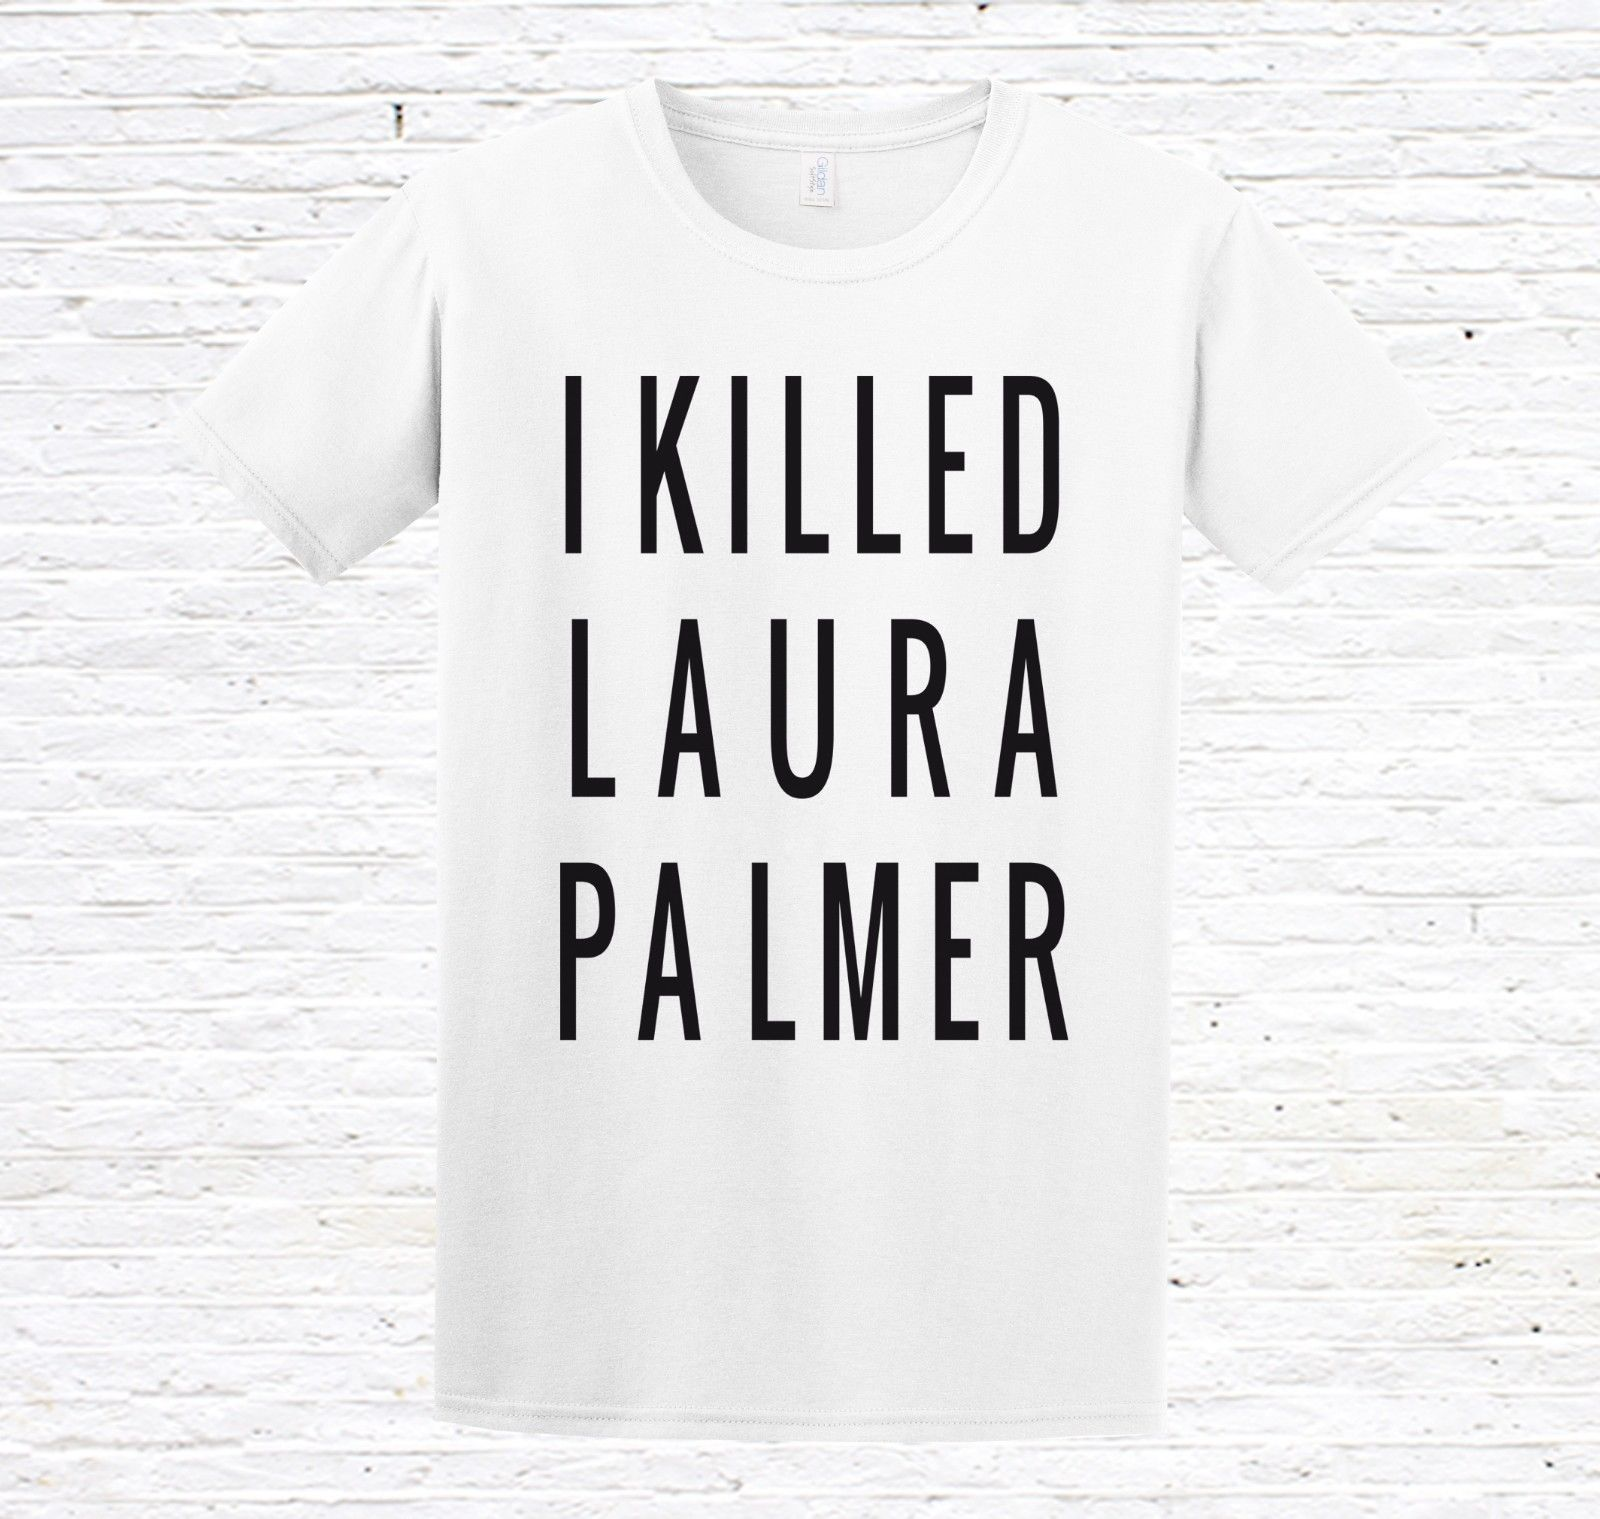 I Killed Laura Palmer T-Shirt (twin peaks) Summer Men'S fashion Tee,Comfortable t shirt,Casual Short Sleeve TEE 2019 hot tees